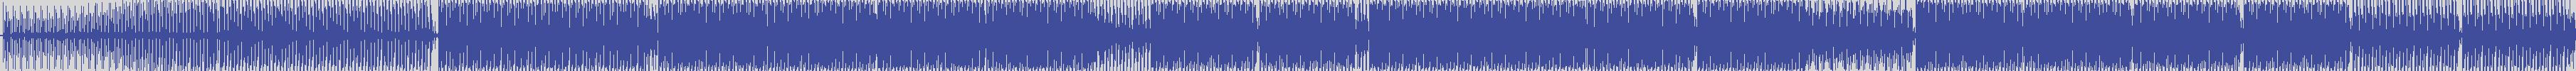 delectable [DEL070] Daniele Stella - Trumpet Love ( Rmx ) [Remix] audio wave form